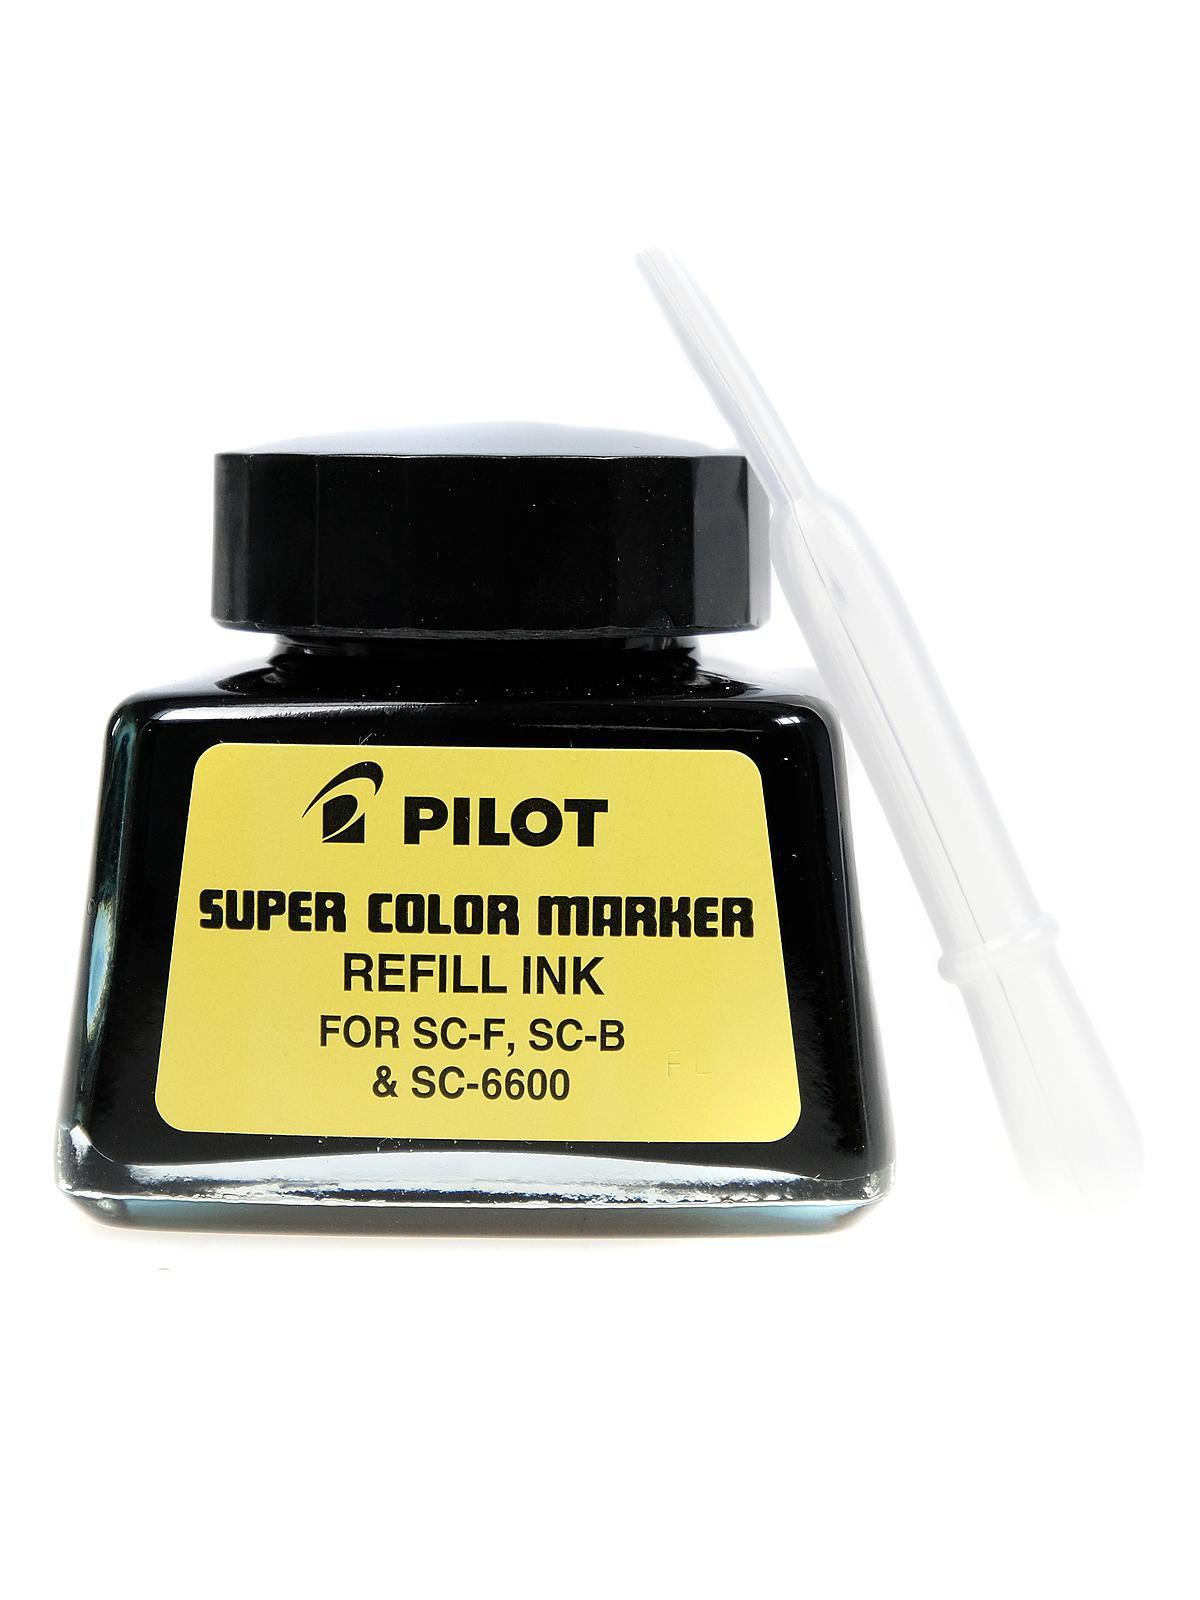 Black Pilot SC-RF Refill Ink for Permanent Markers Pilot 43500 - 1 Each